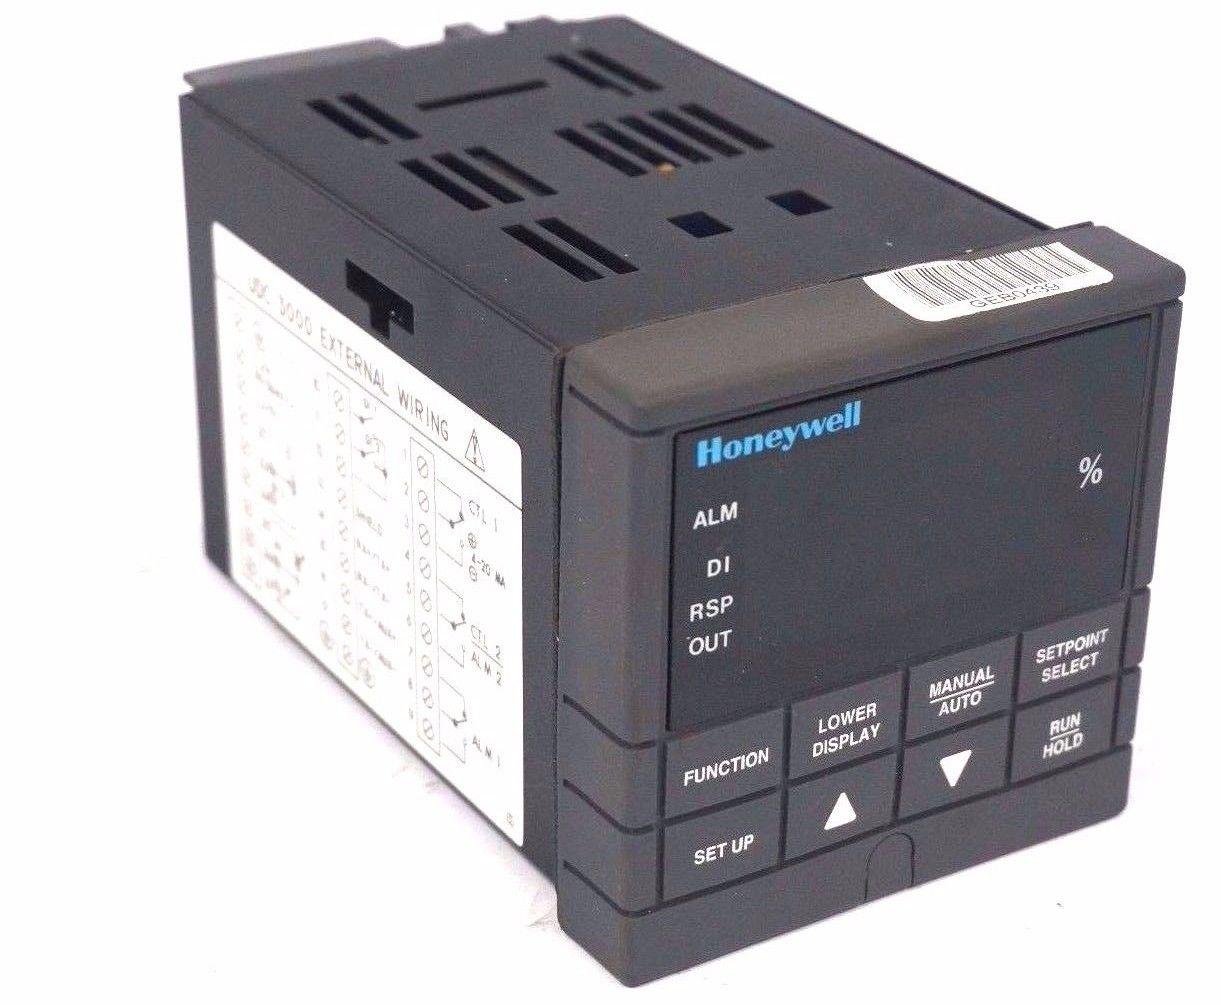 Honeywell Udc 3000 Manual Control on